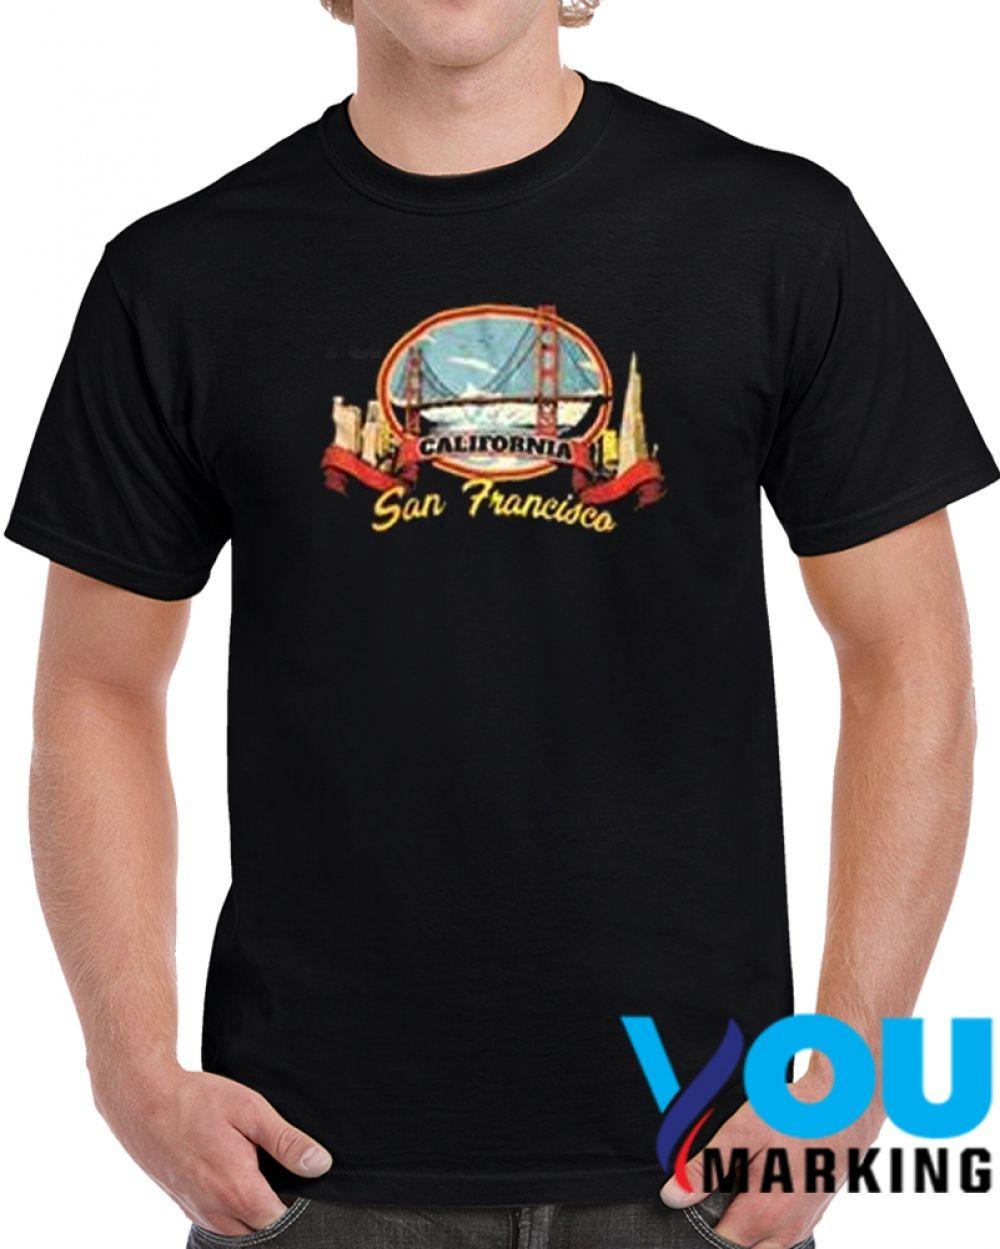 ea7c3cbc4 Tee Shirt Printing San Francisco – EDGE Engineering and Consulting ...